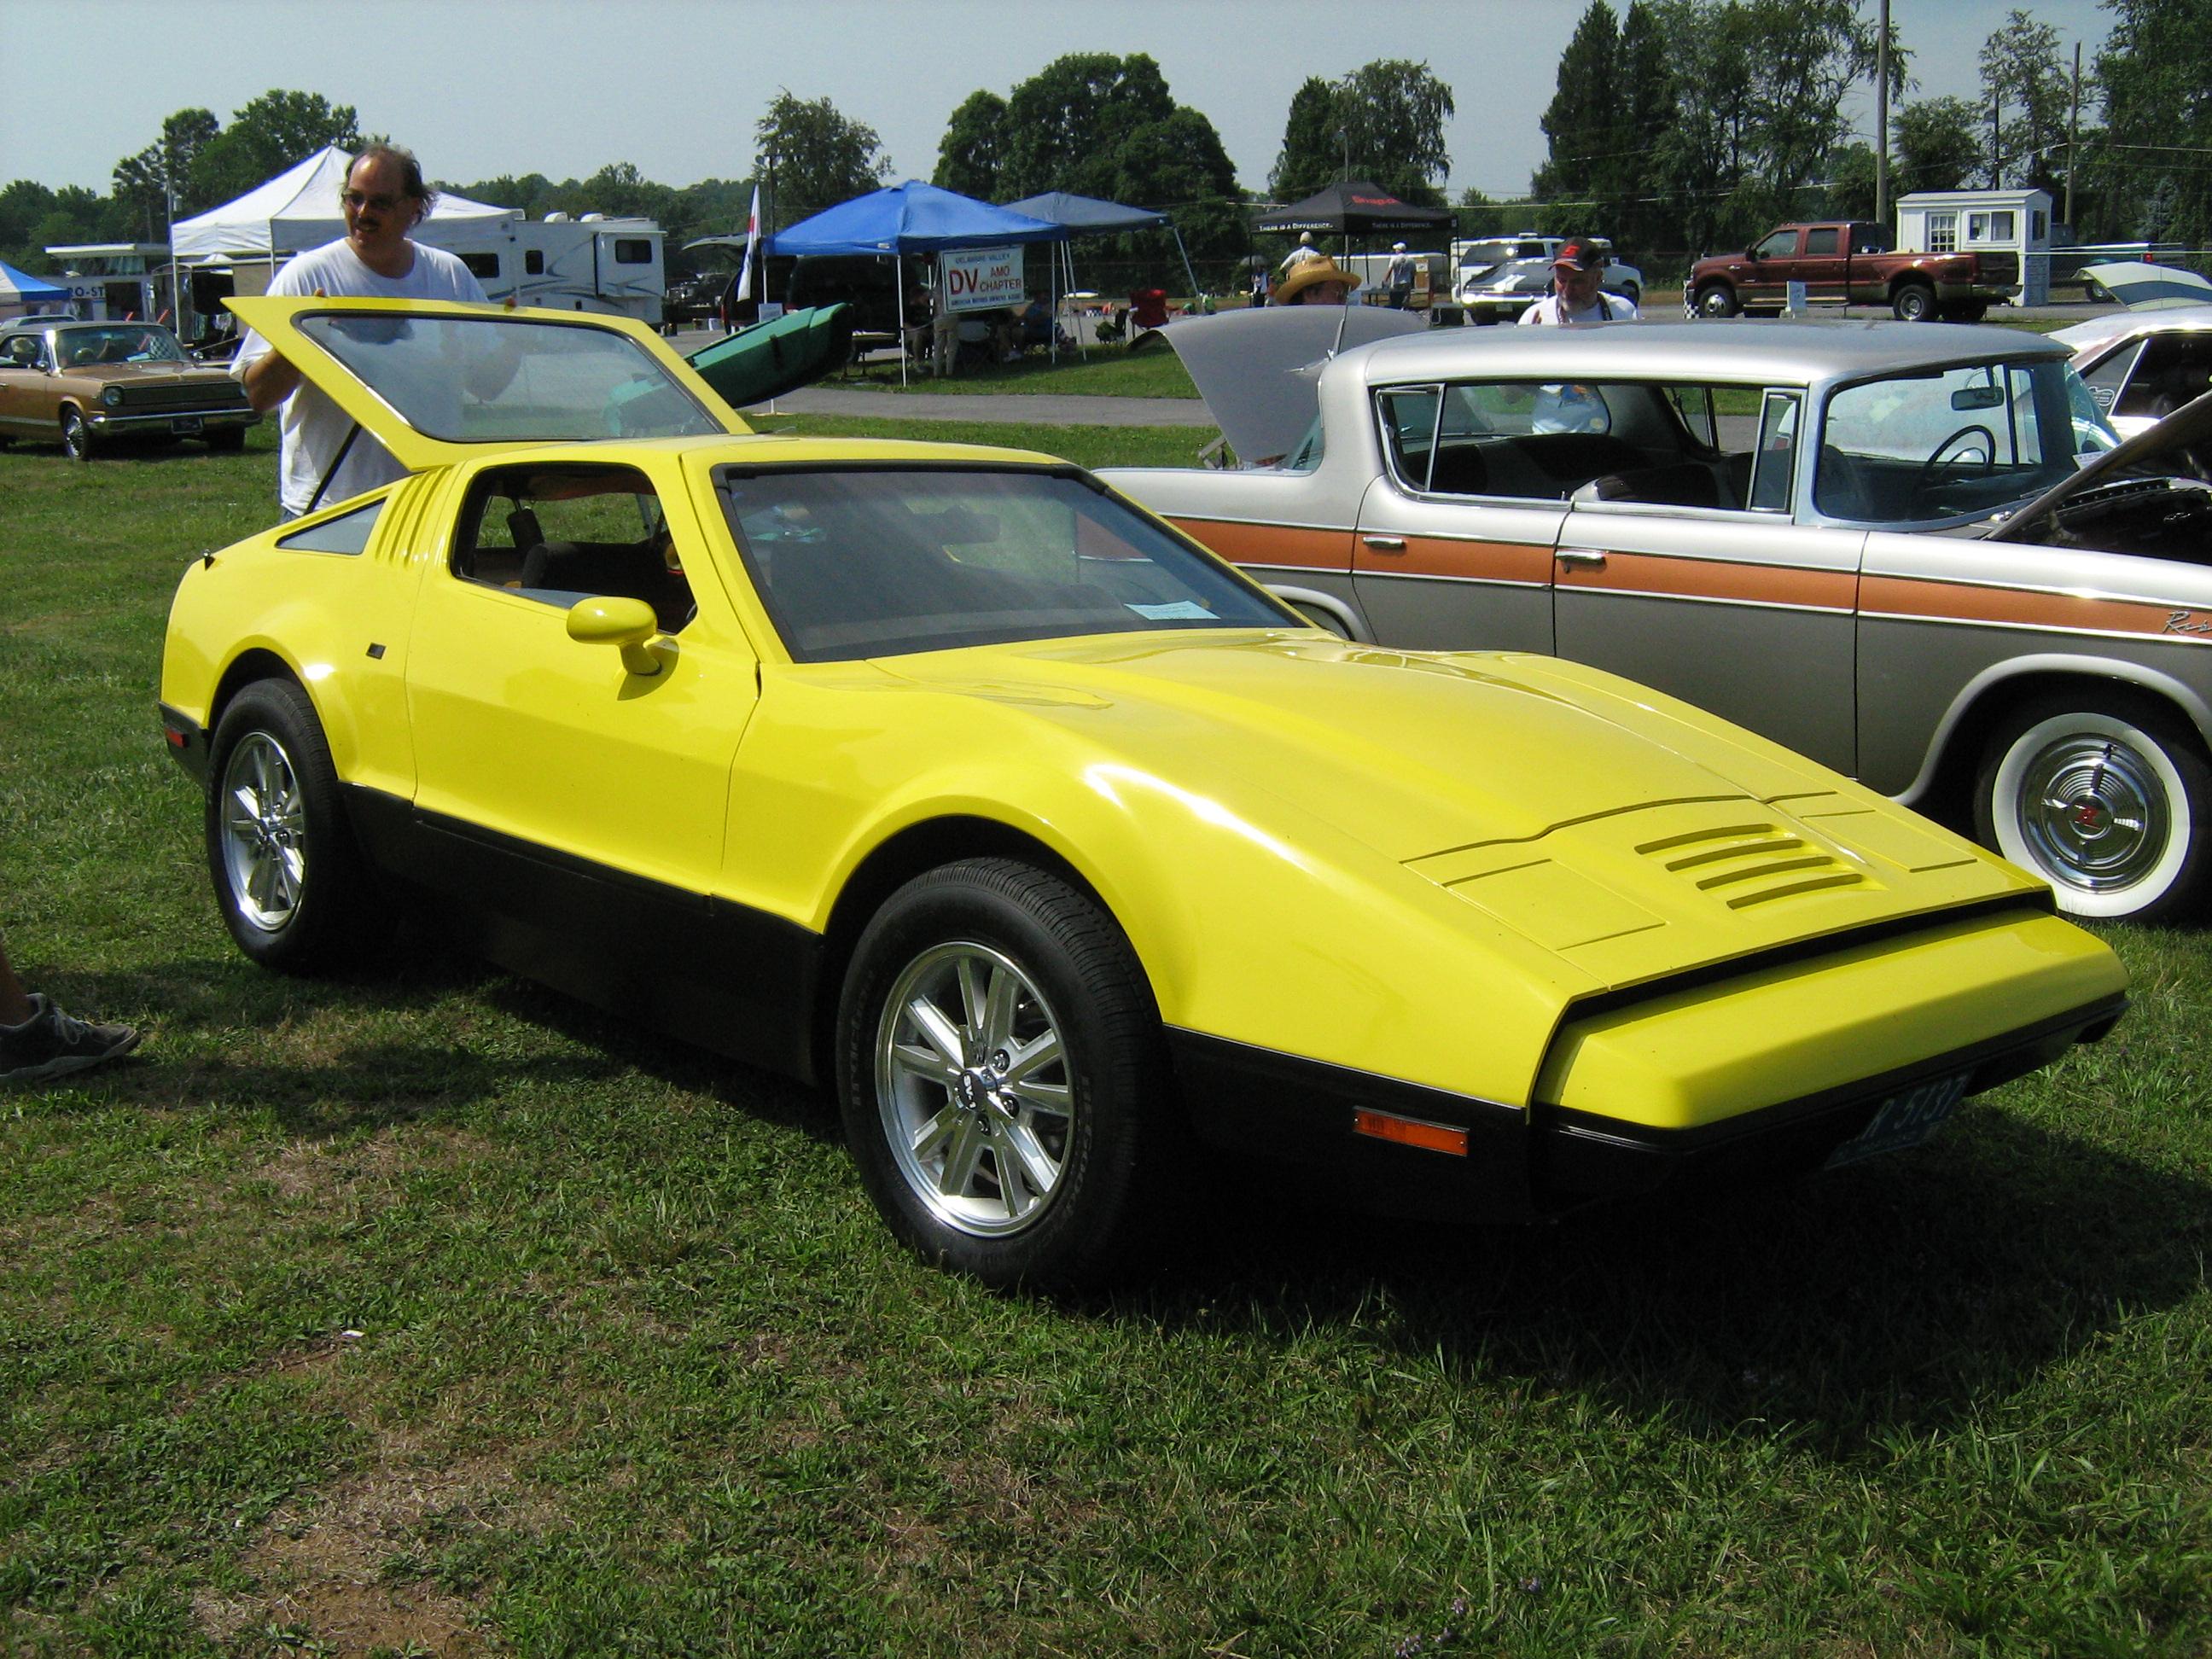 Archivo:1974_Bricklin_yellow_sd Cecil'10on 1974 Bricklin Sv 1